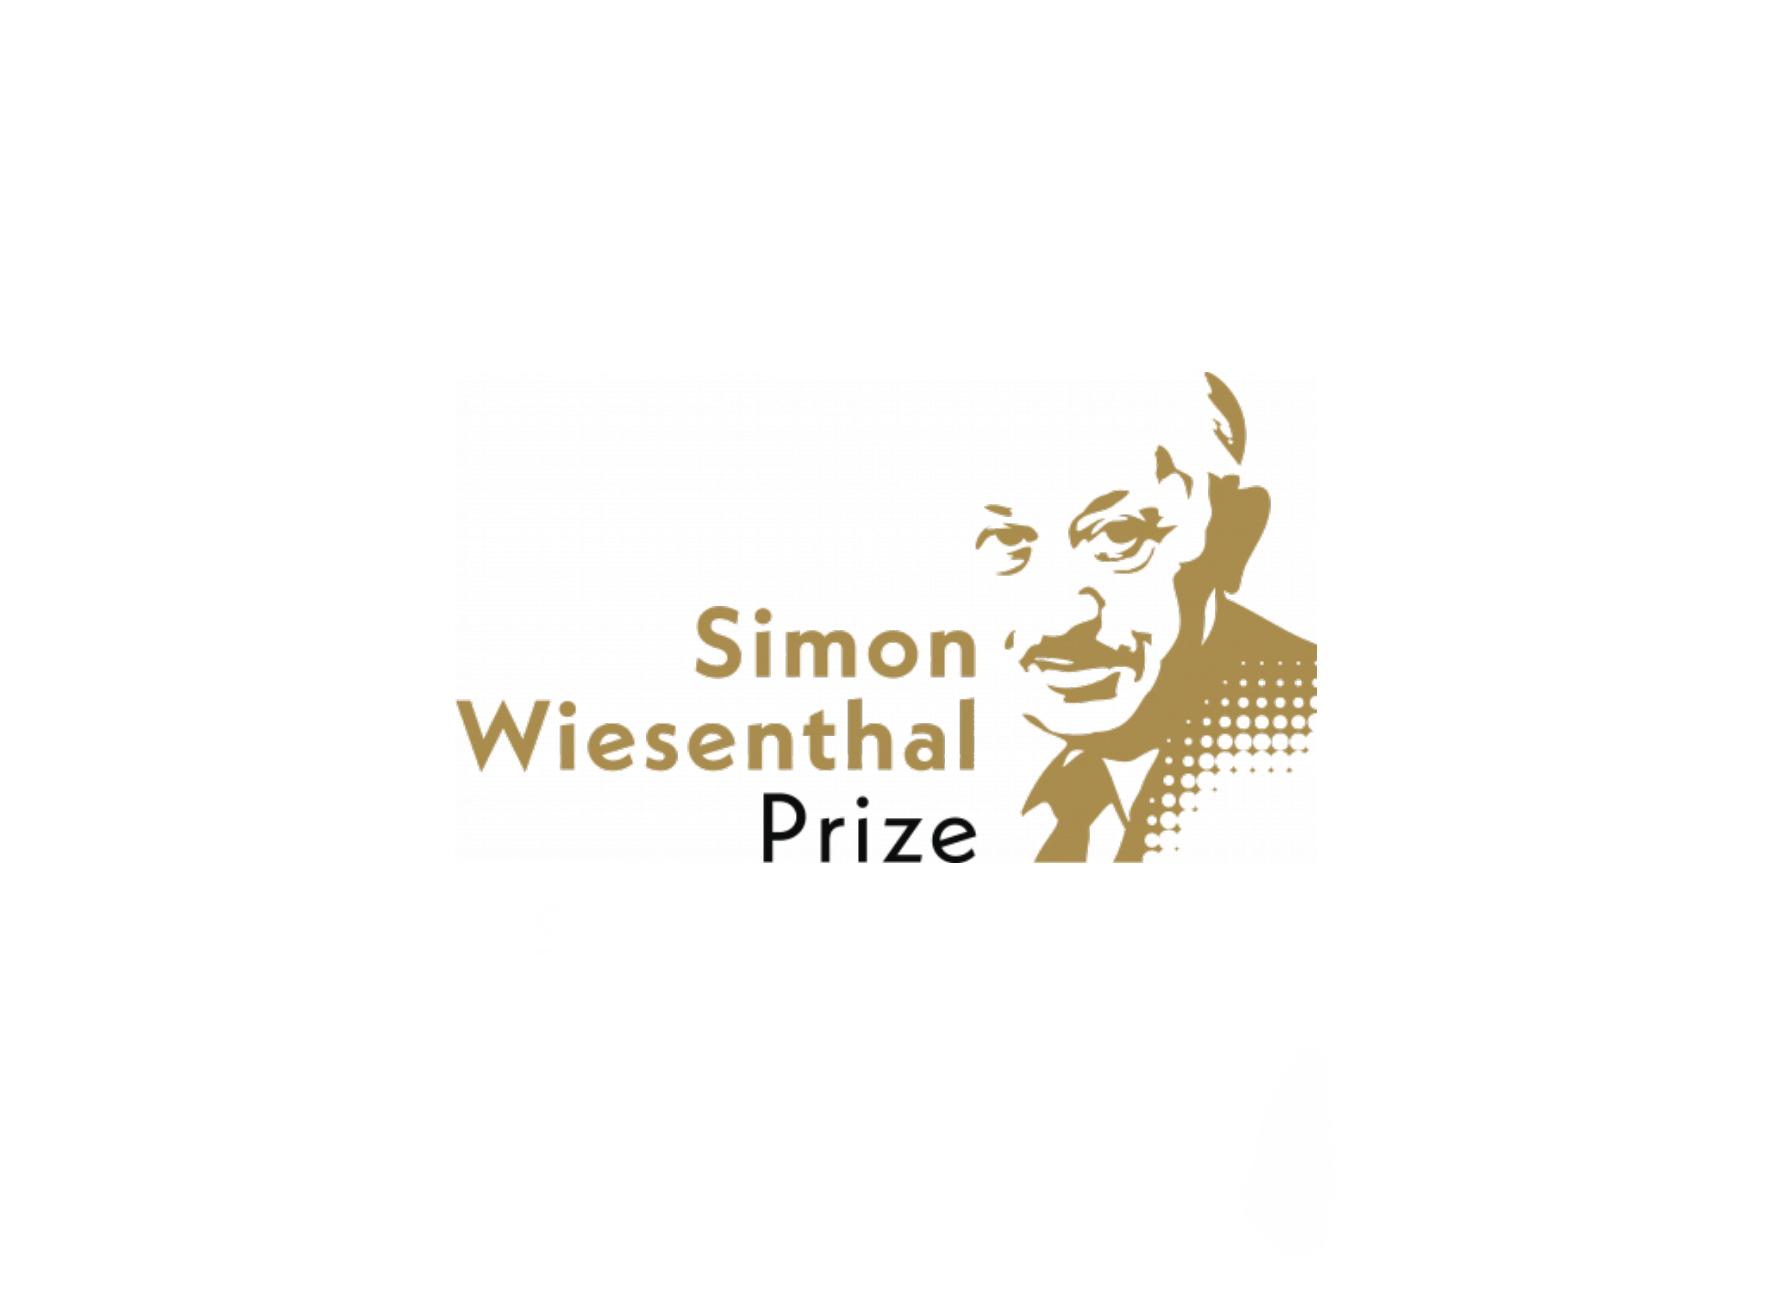 Nagrada Simon Wiesenthal